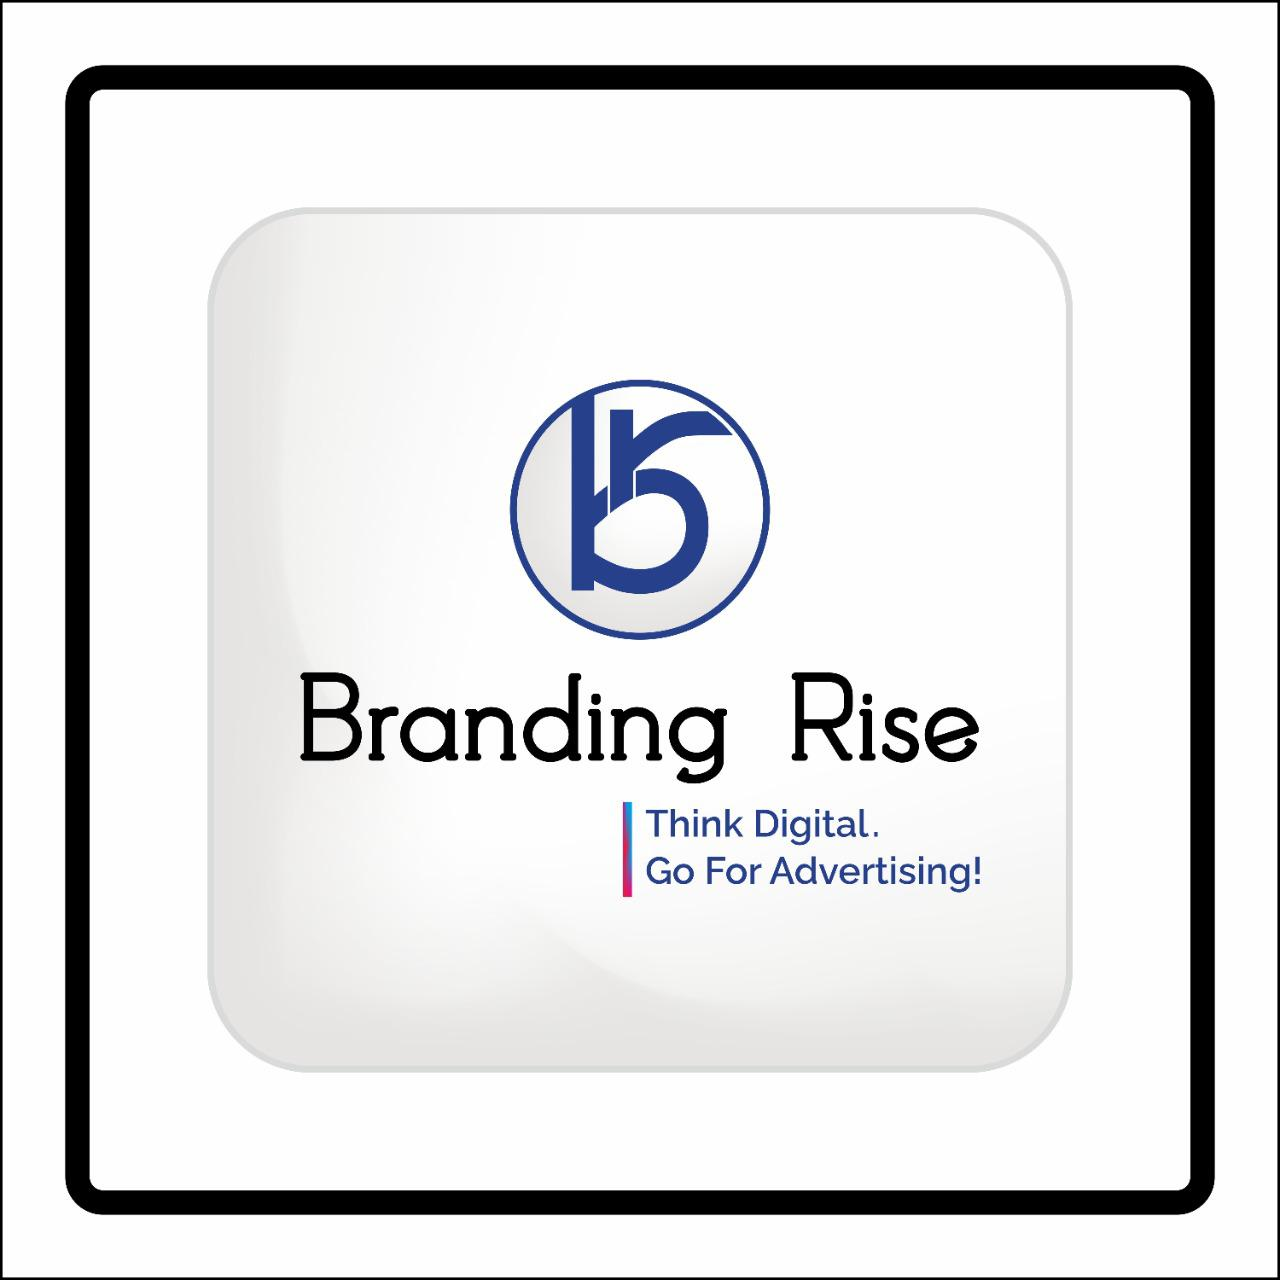 Branding Rise